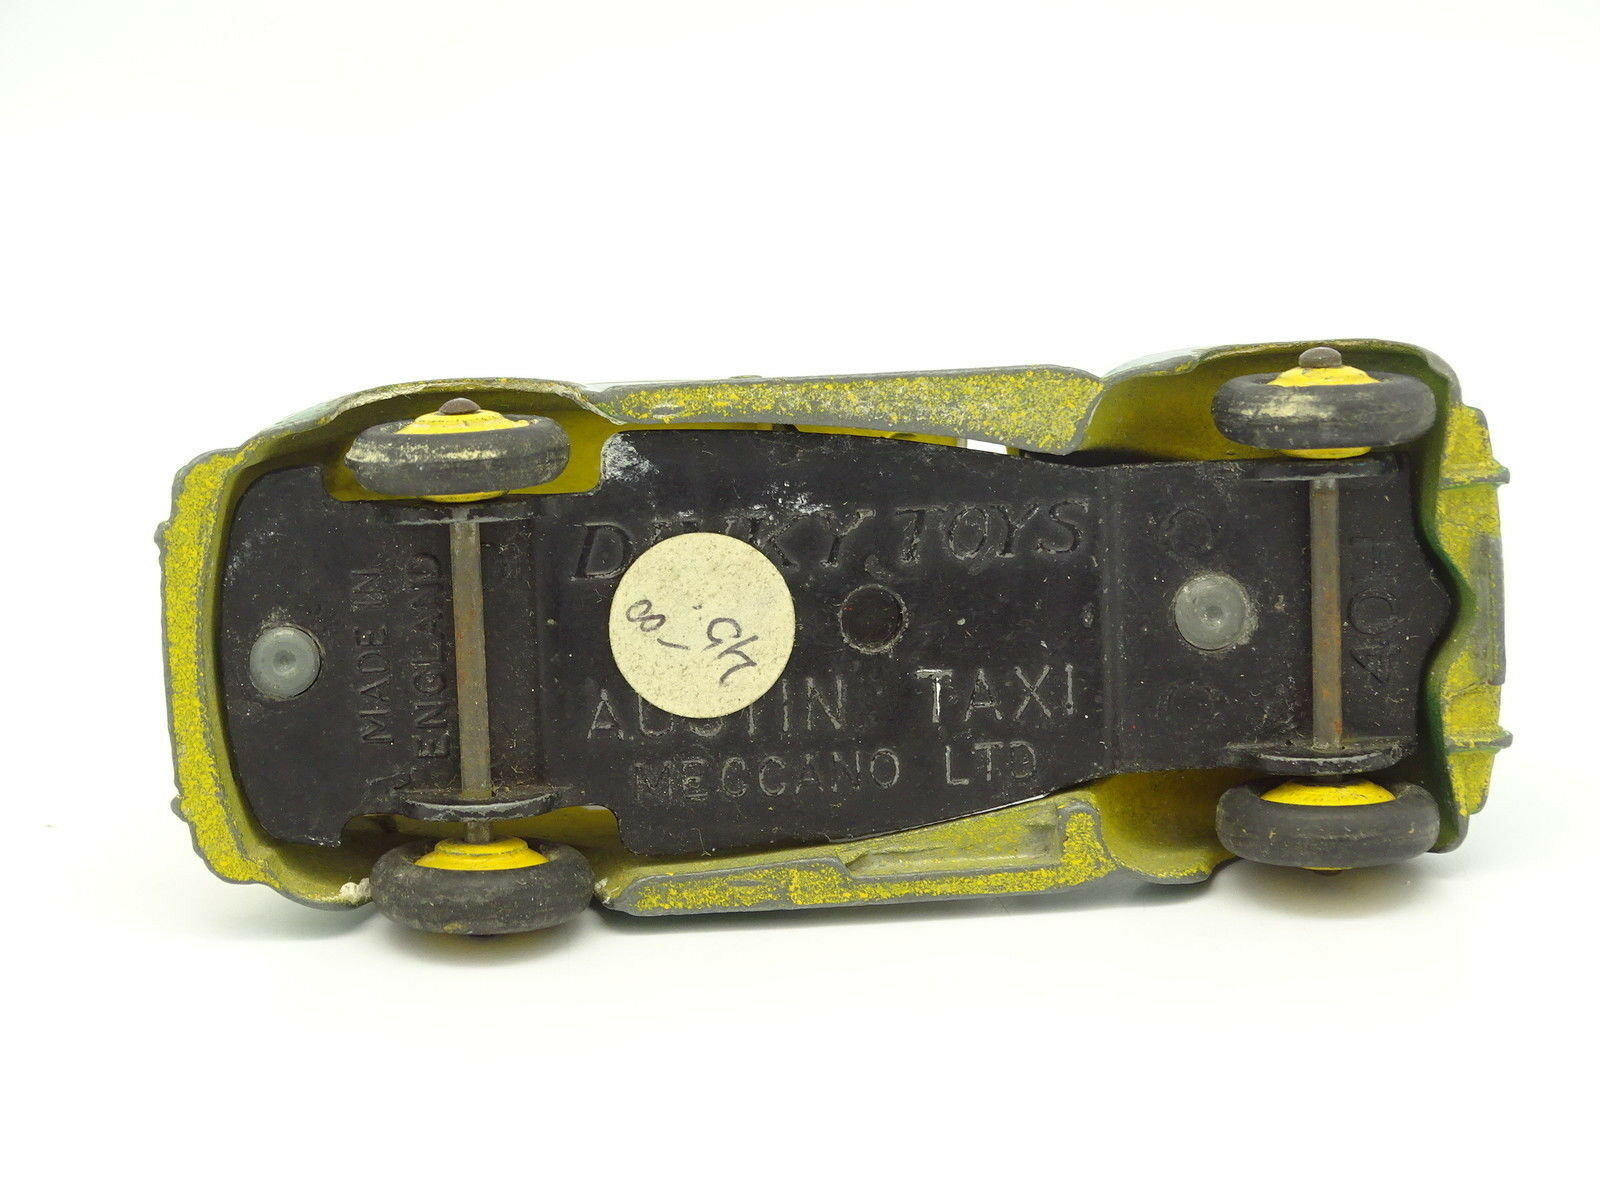 Dinky Toys GB SB 1 43 - Austin Taxi green green green y yellow B 98b00b